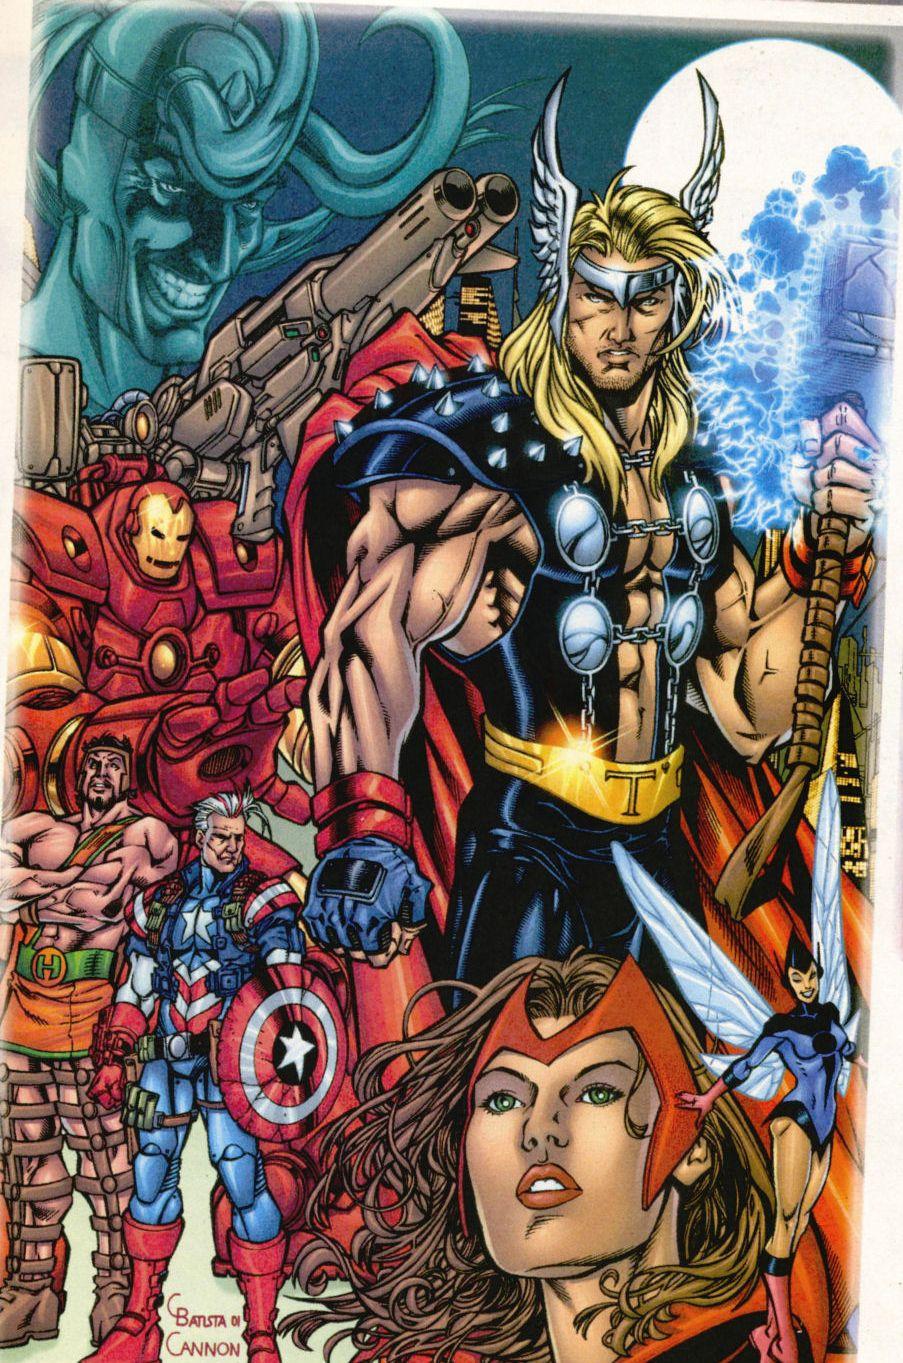 Avengers (Earth-8710)/Gallery